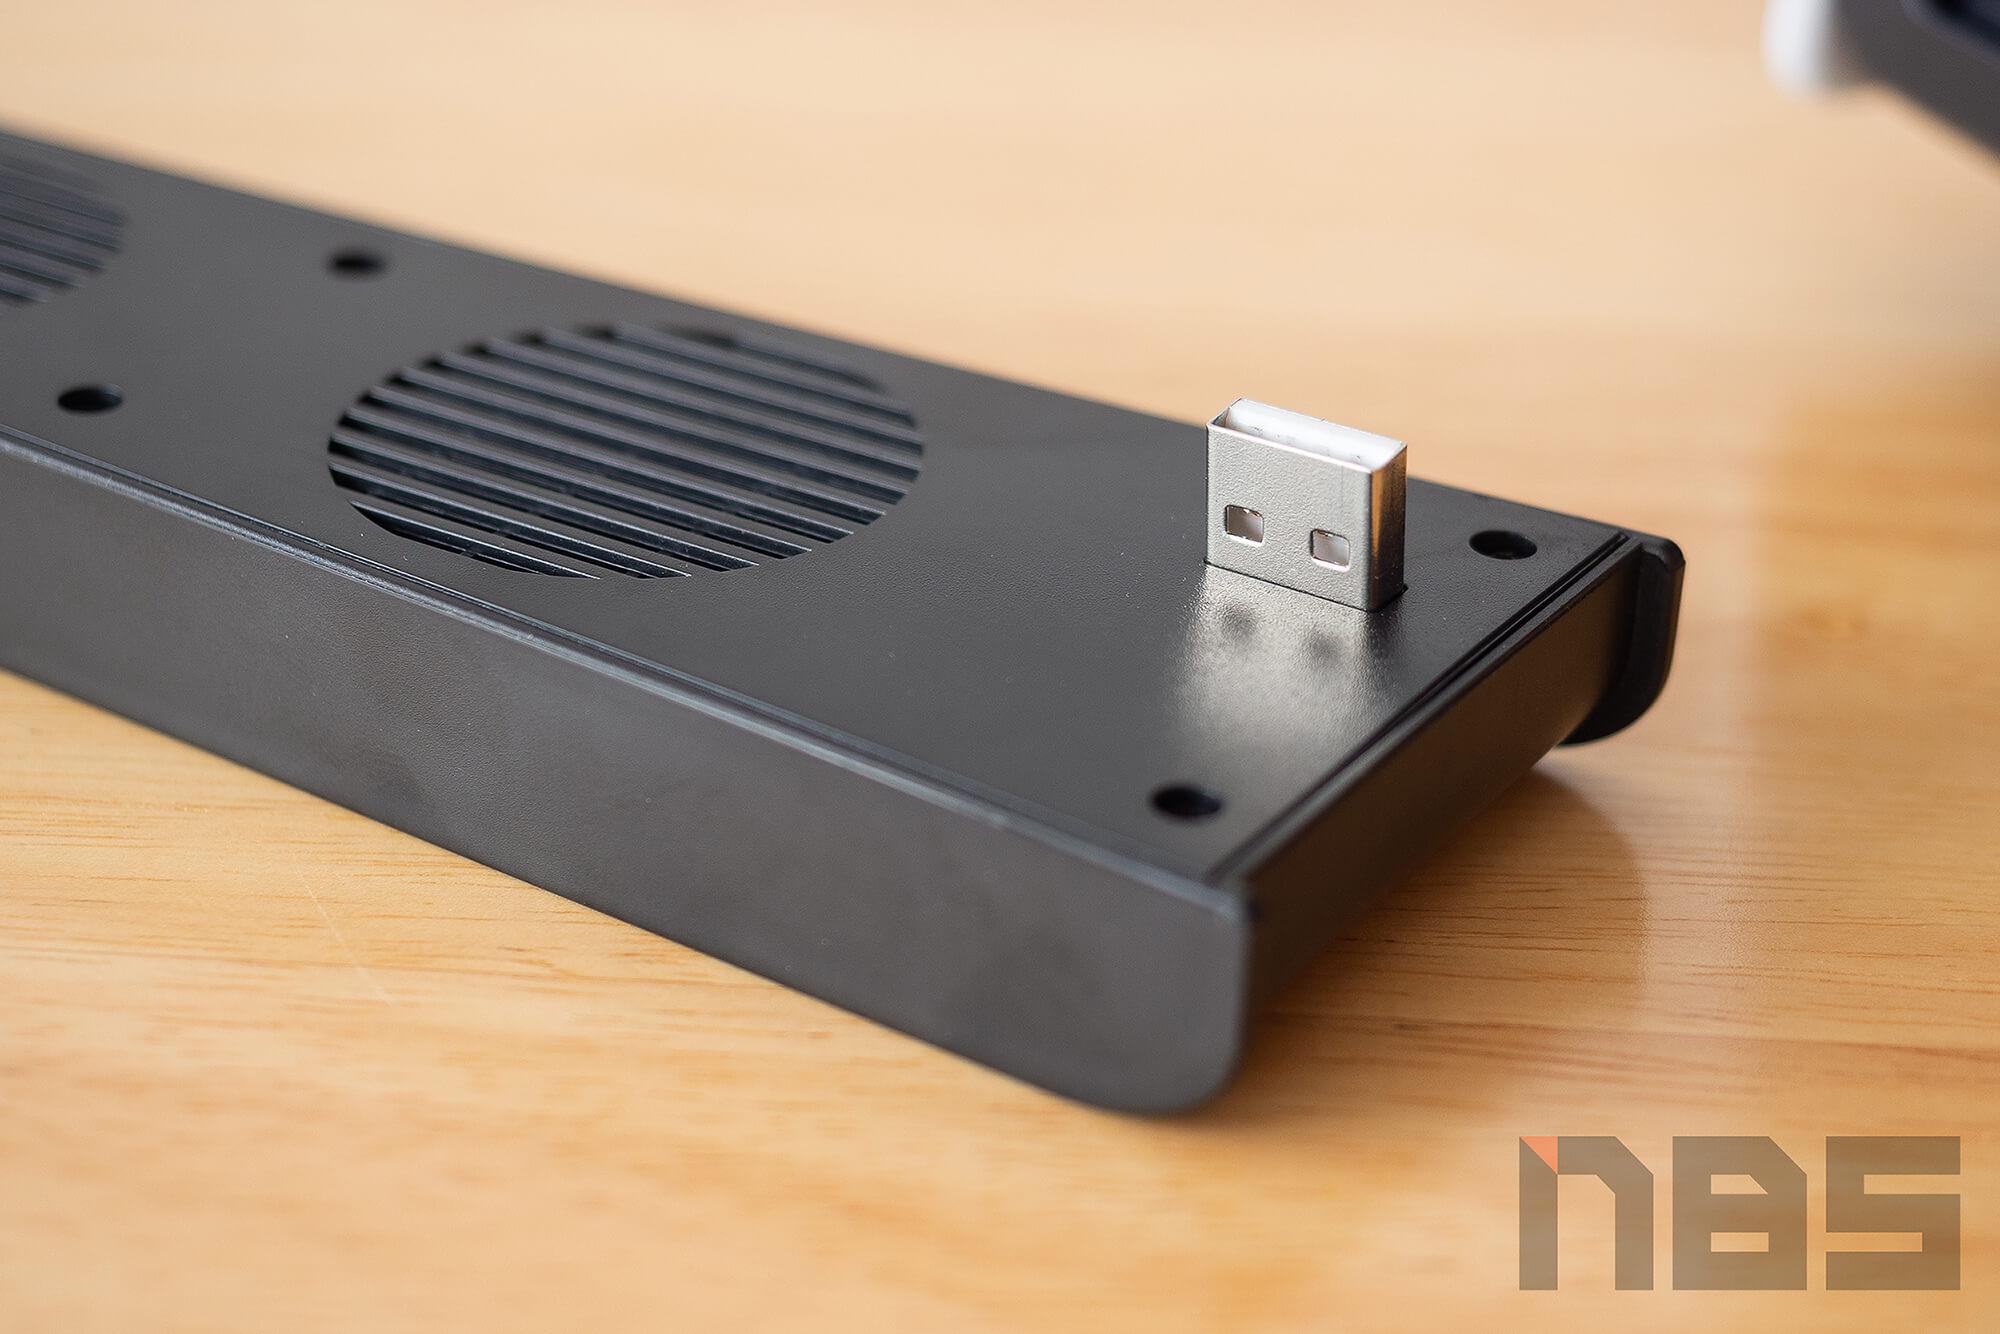 Review PS5 Fan NotebookSPEC 13